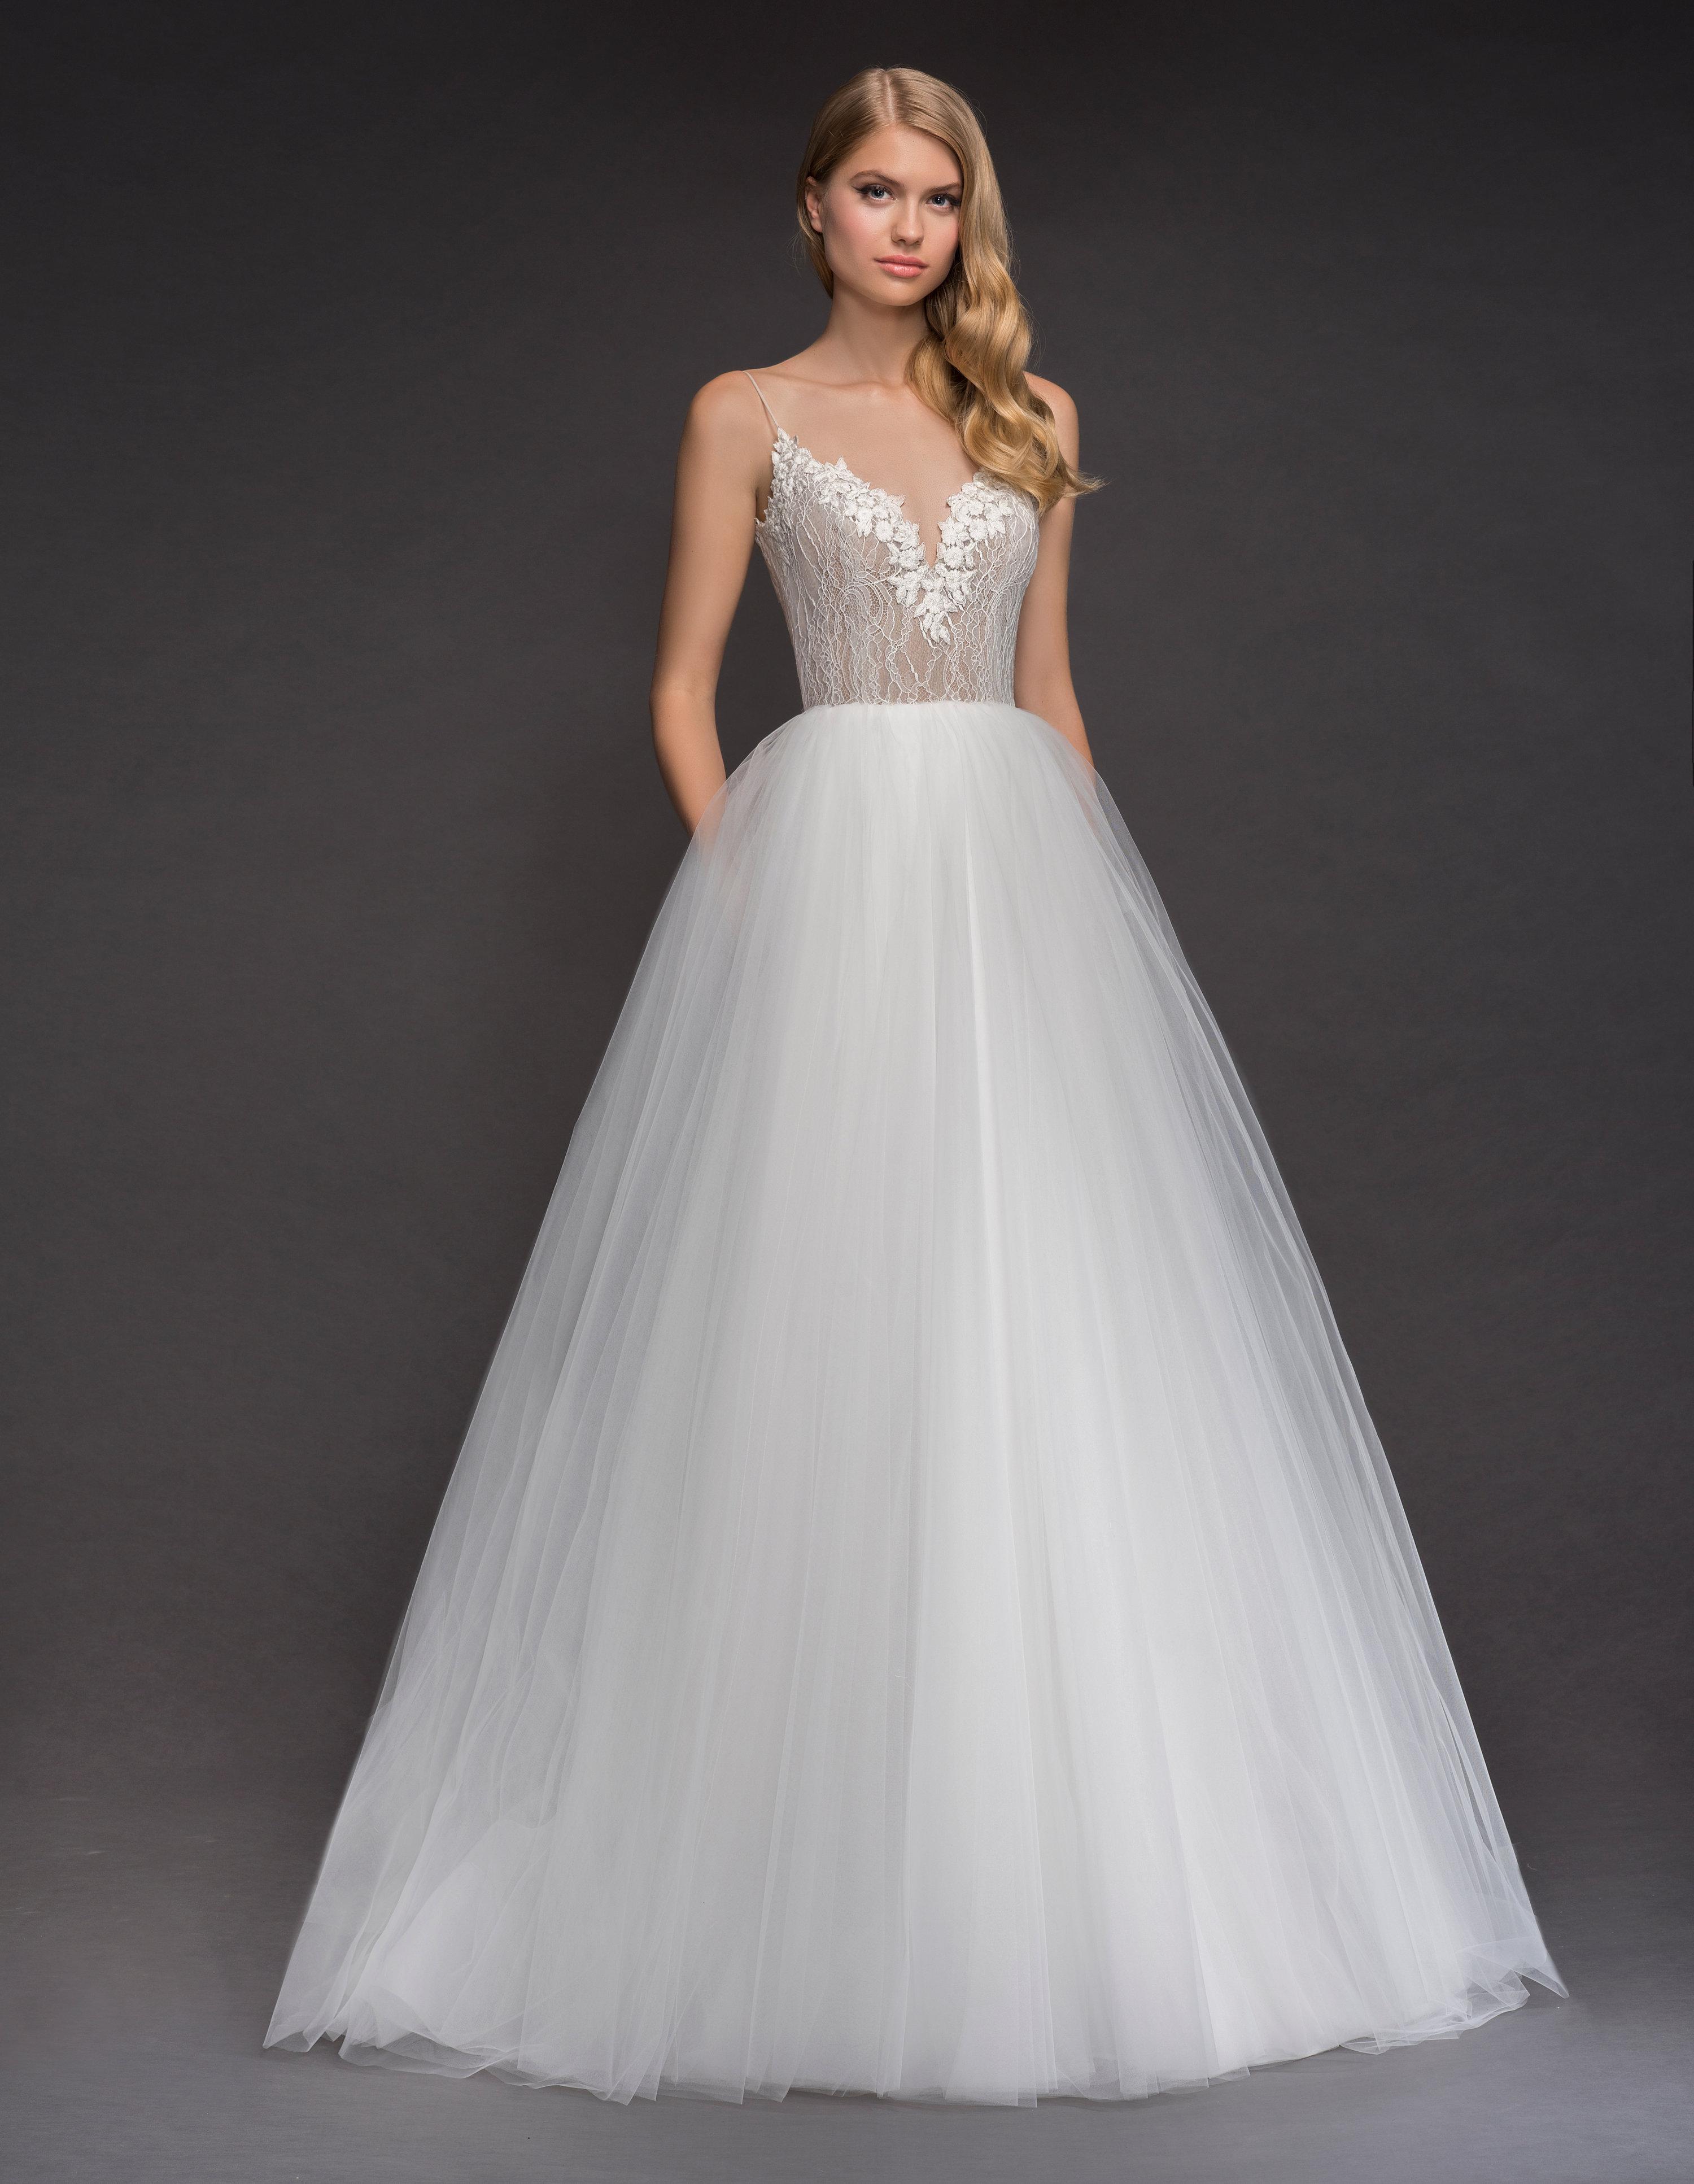 Spaghetti Strap Deep Sweetheart Neckline Tulle Skirt Wedding Dress